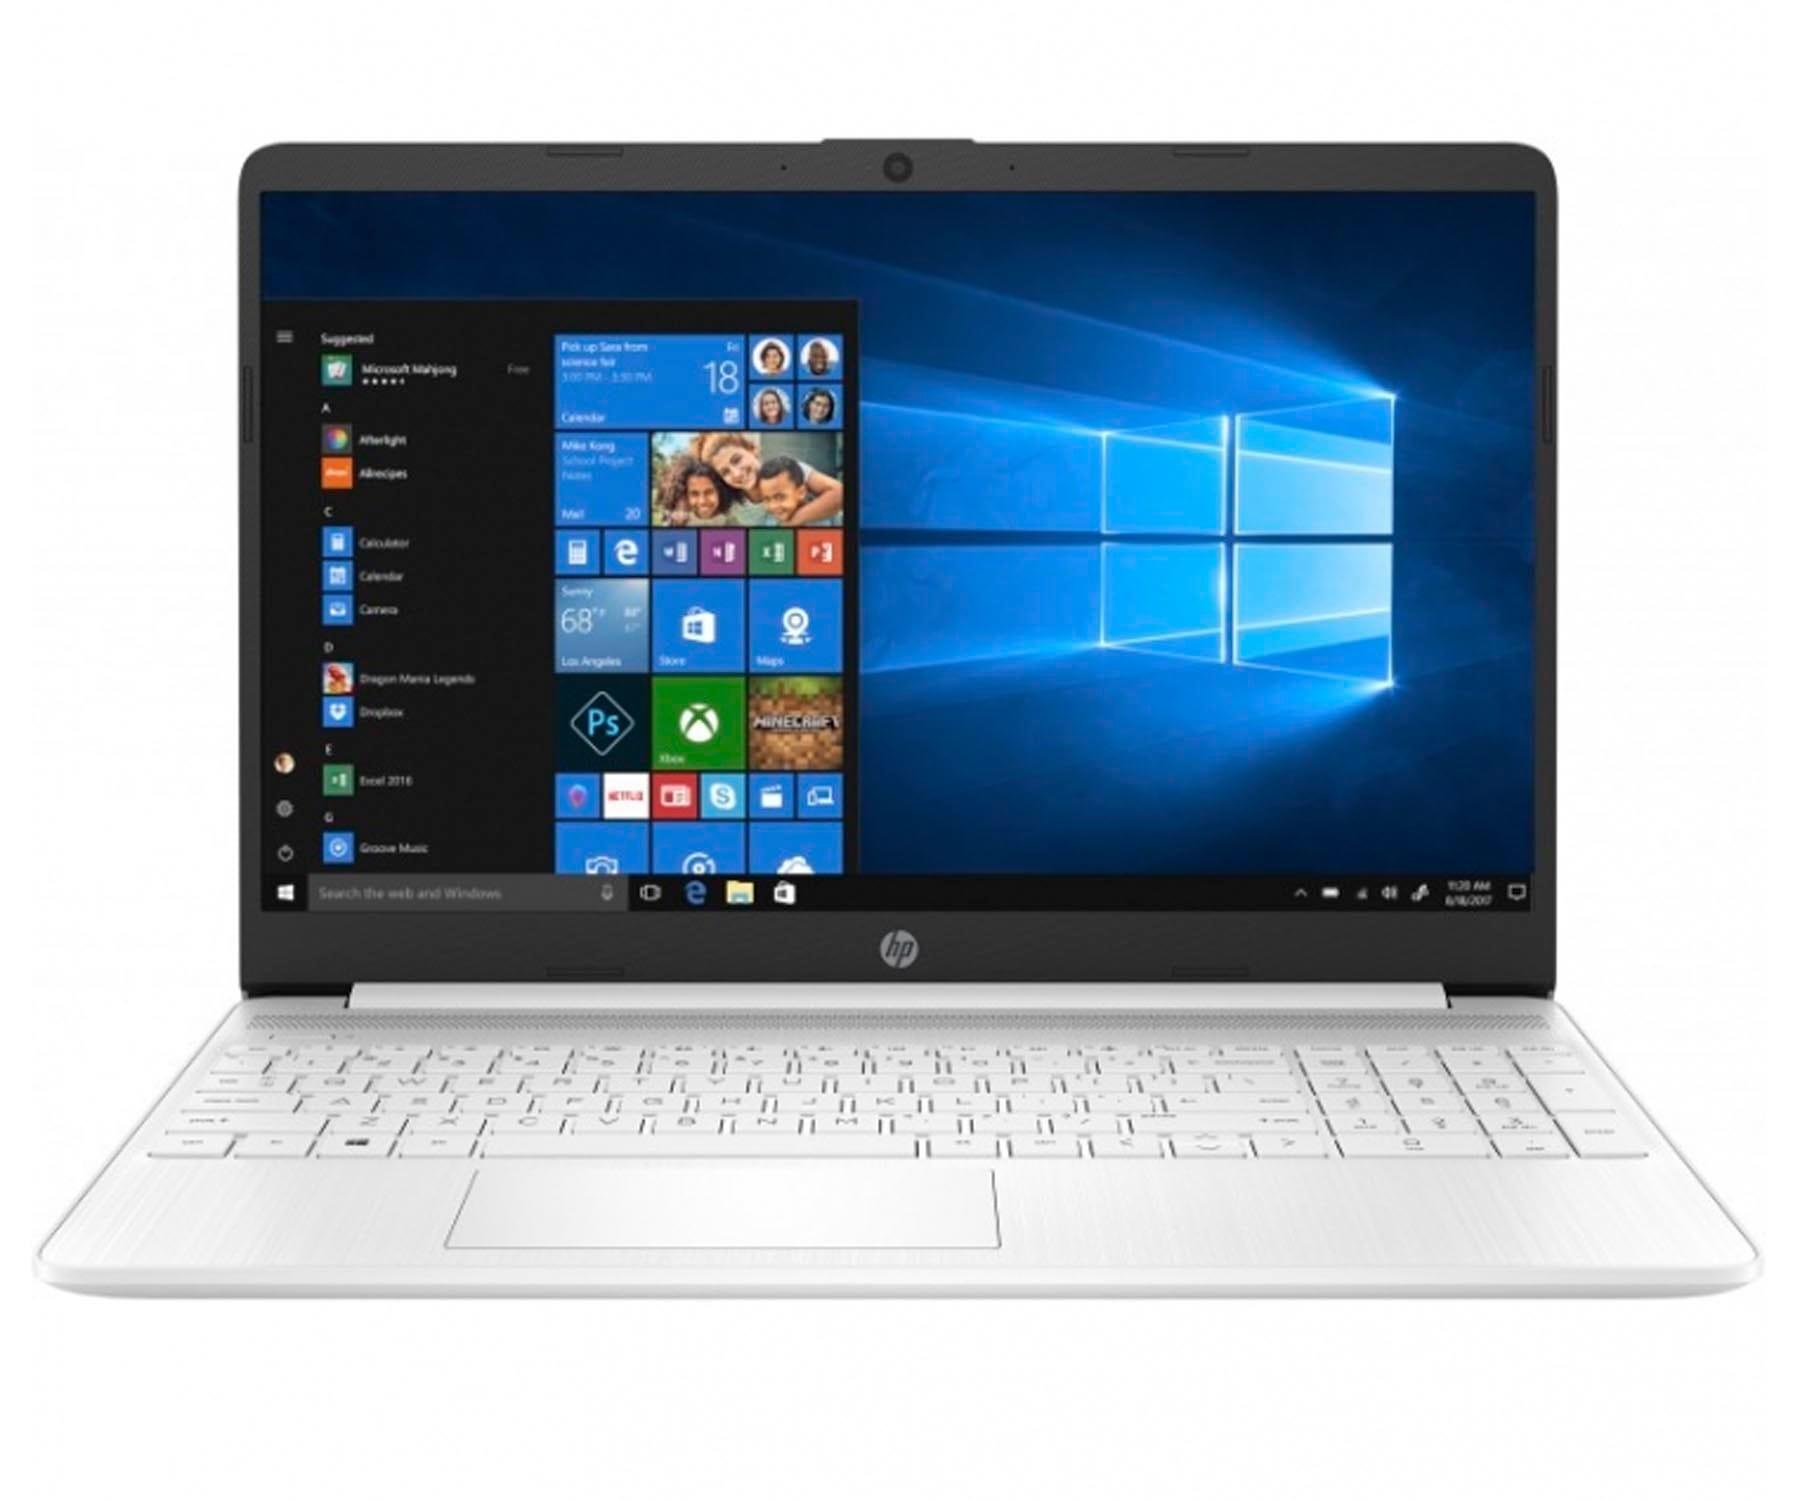 HP LAPTOP 15s-FQ1031 BLANCO PORTÁTIL 15.6'' HD i5-1035G1 1TB SSD 8GB RAM WINDOWS 10 HOME